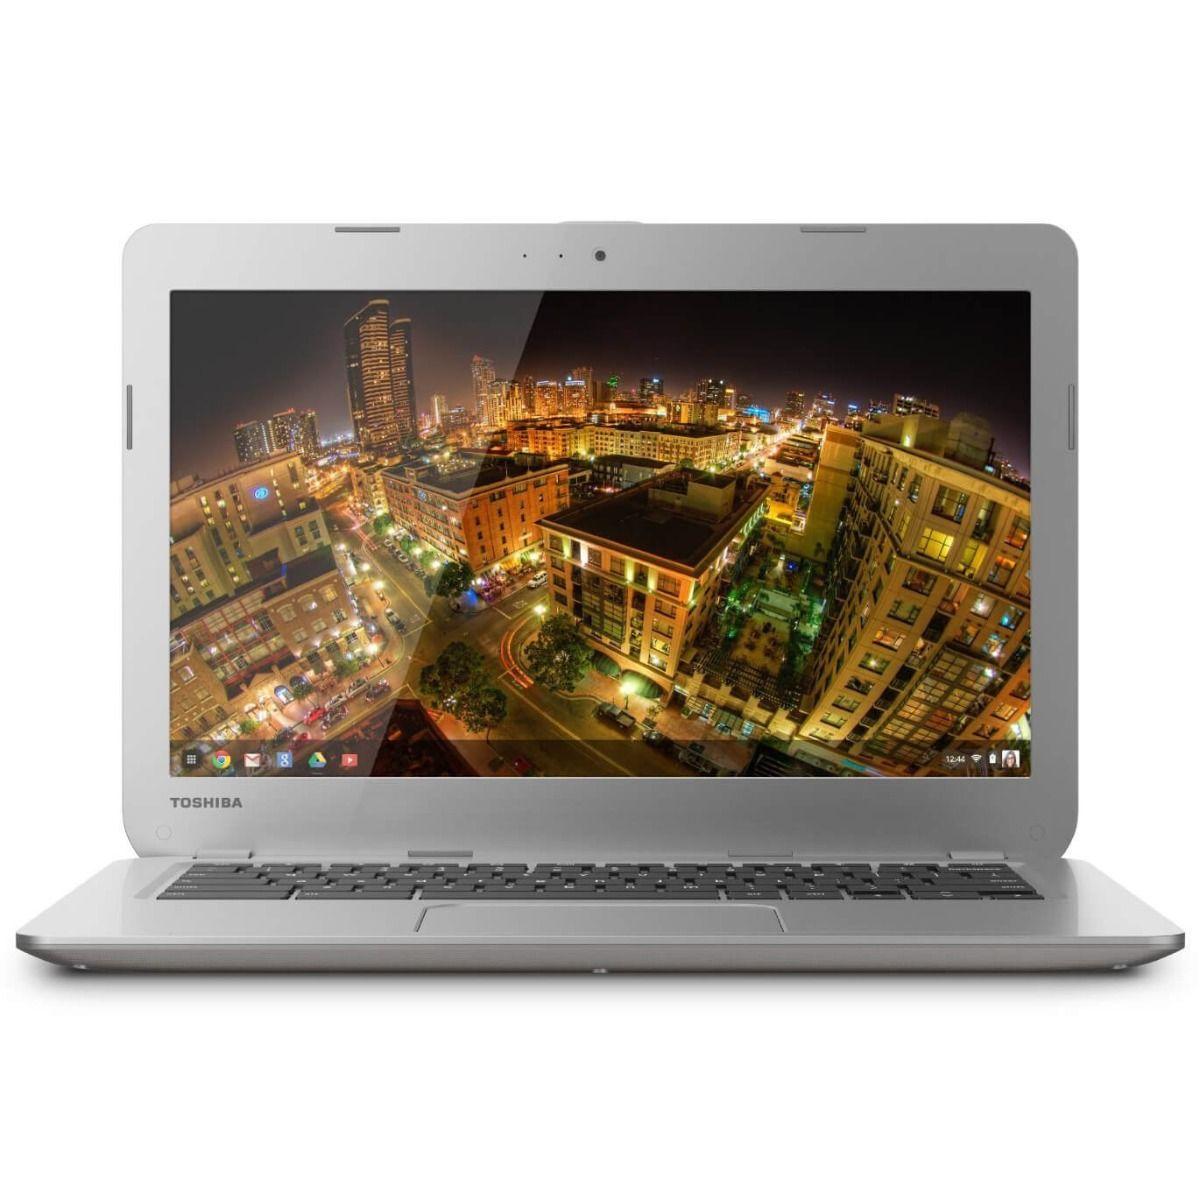 "Toshiba Laptop Chromebook 13.3"" 16GB Webcam HDMI Refurbished Intel Sale Chrome OS Gold"